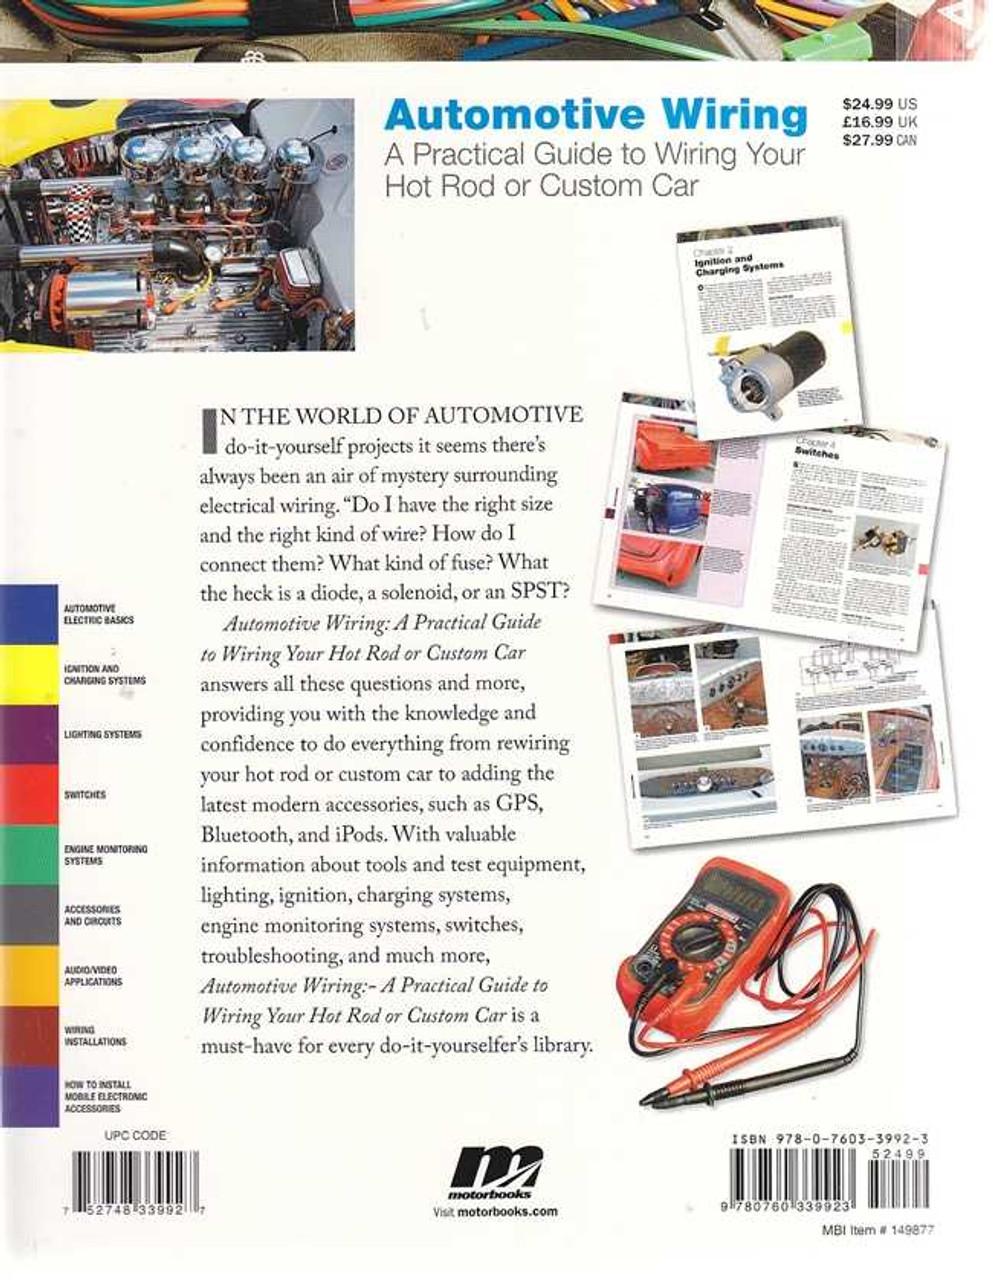 Admirable Automotive Wiring A Practical Guide To Wiring Your Hot Rod Or Wiring Cloud Battdienstapotheekhoekschewaardnl